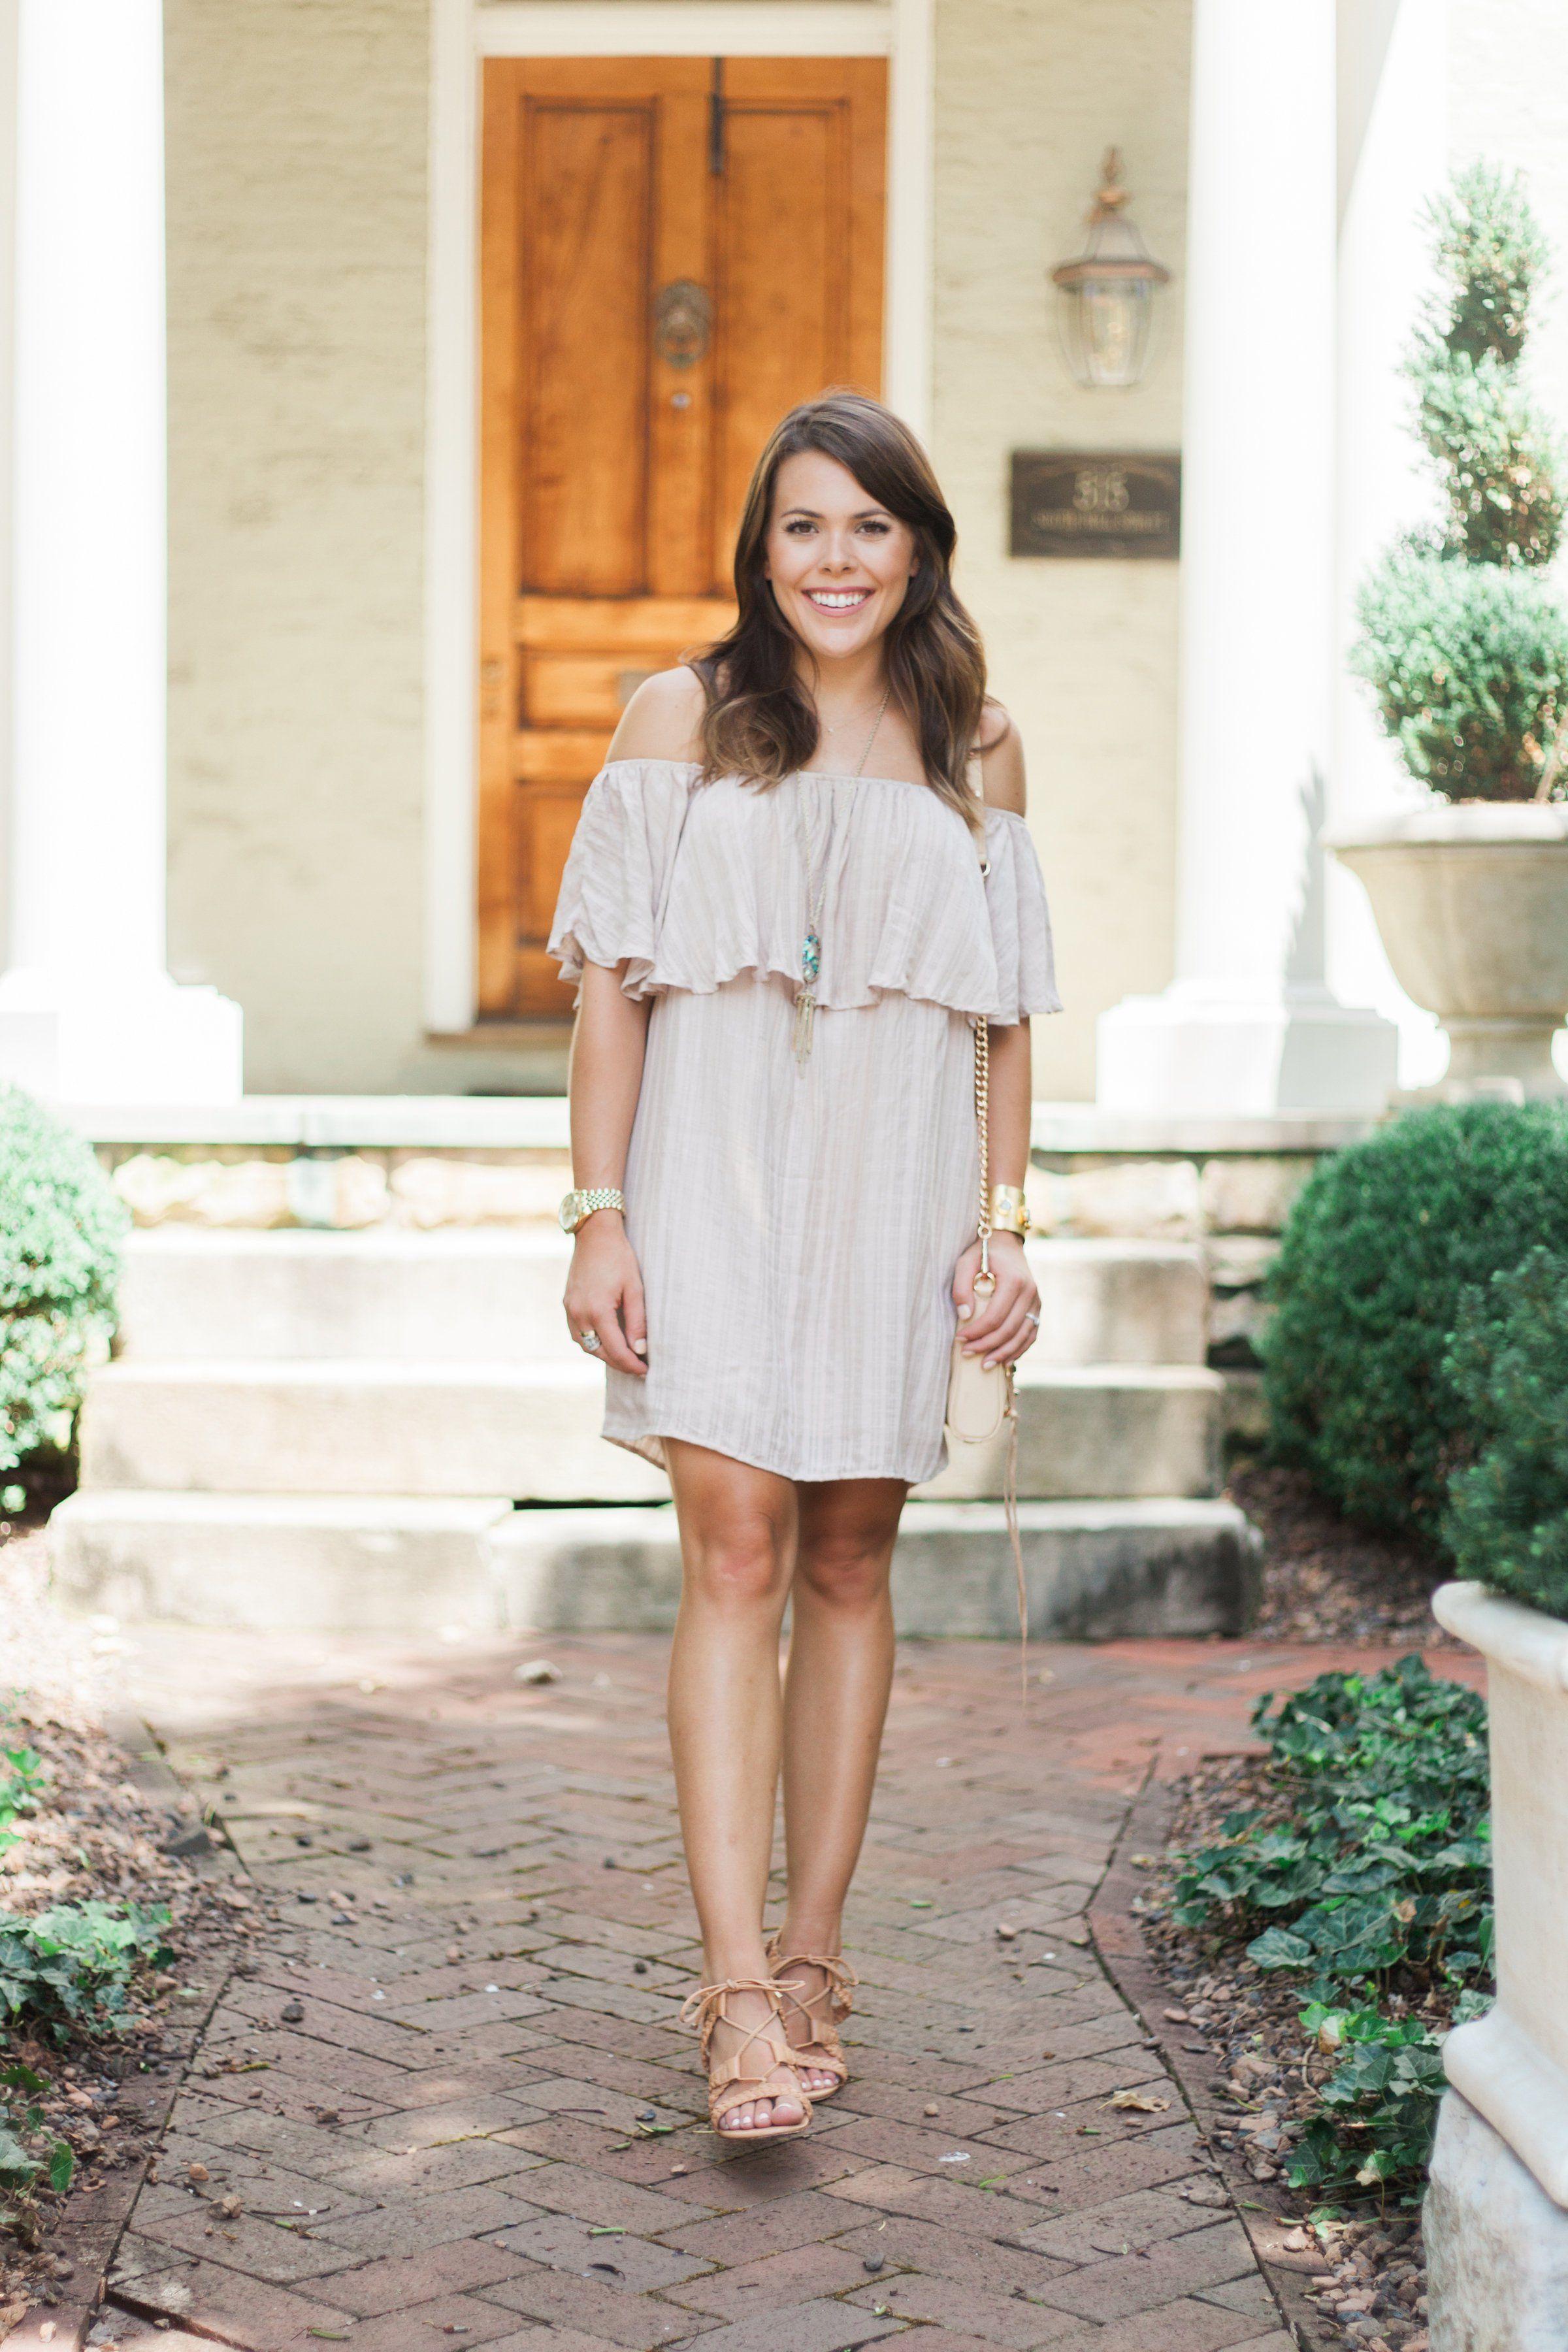 fe468c6c226 Summer Style via Glitter   Gingham    Off The Shoulder Dress